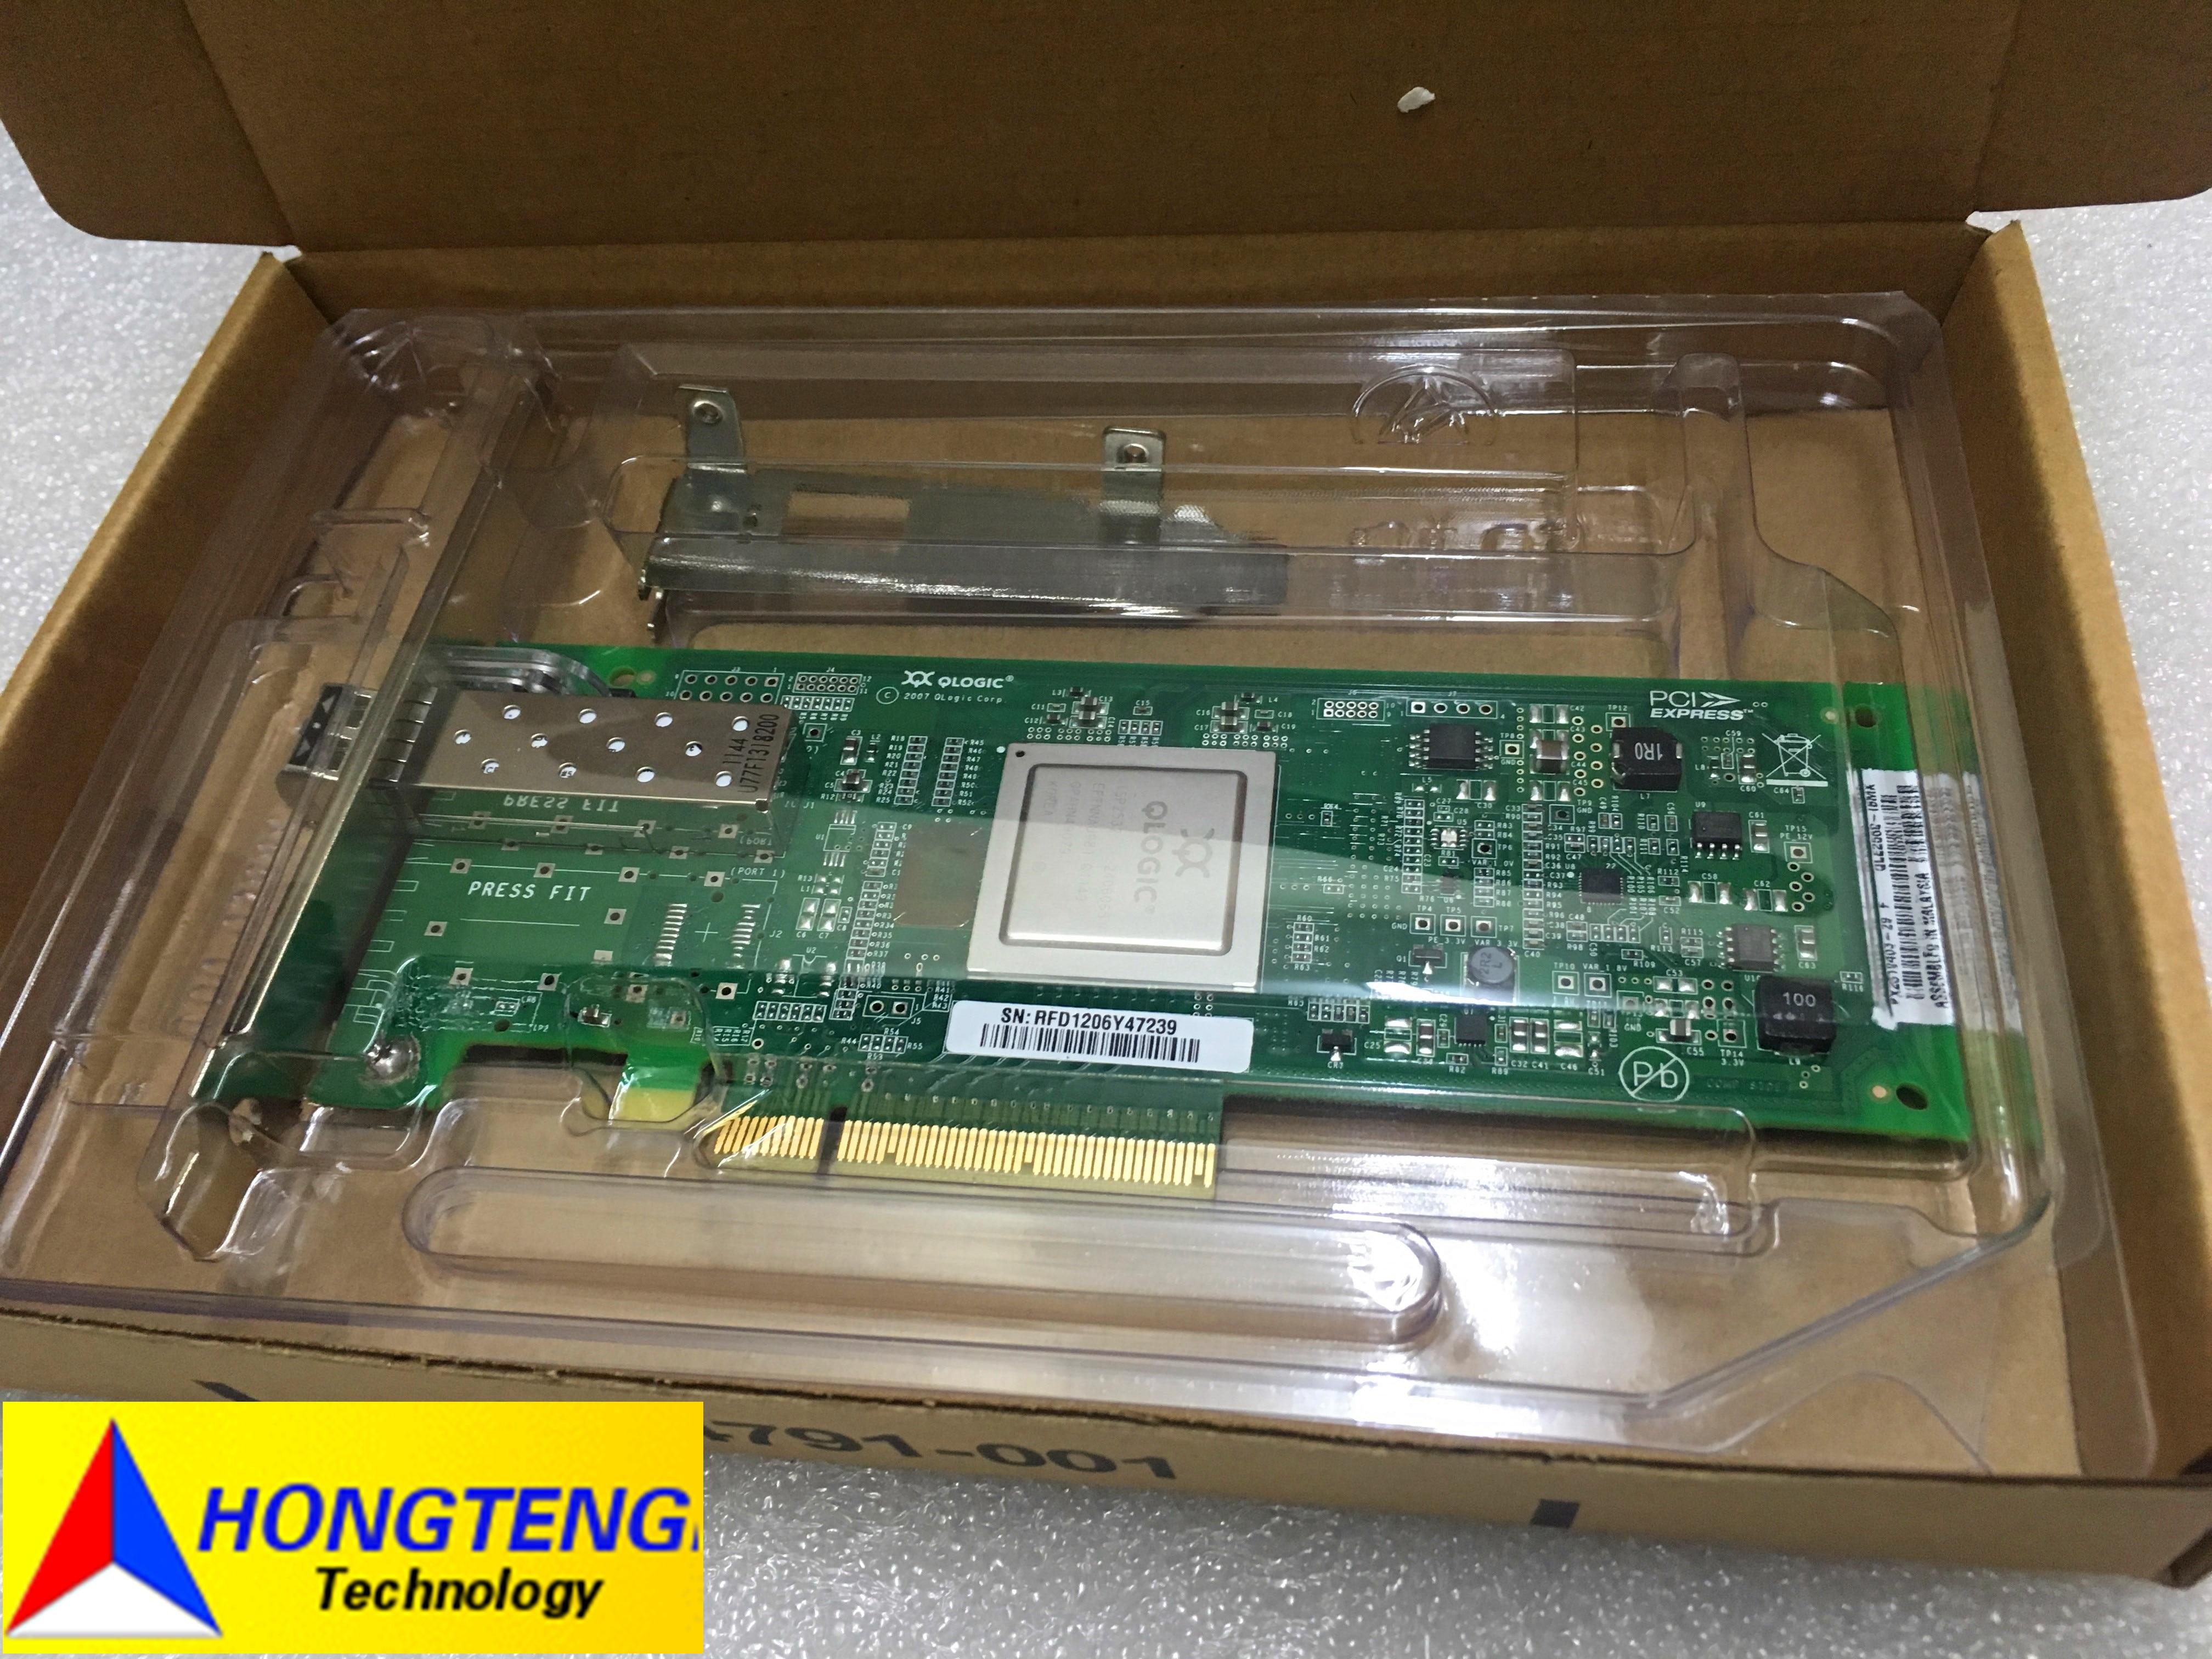 محول HP StorageWorks 8GB FC HBA QLE2560 489190-001 P/N AK344 ، اختبار OK ، شحن مجاني